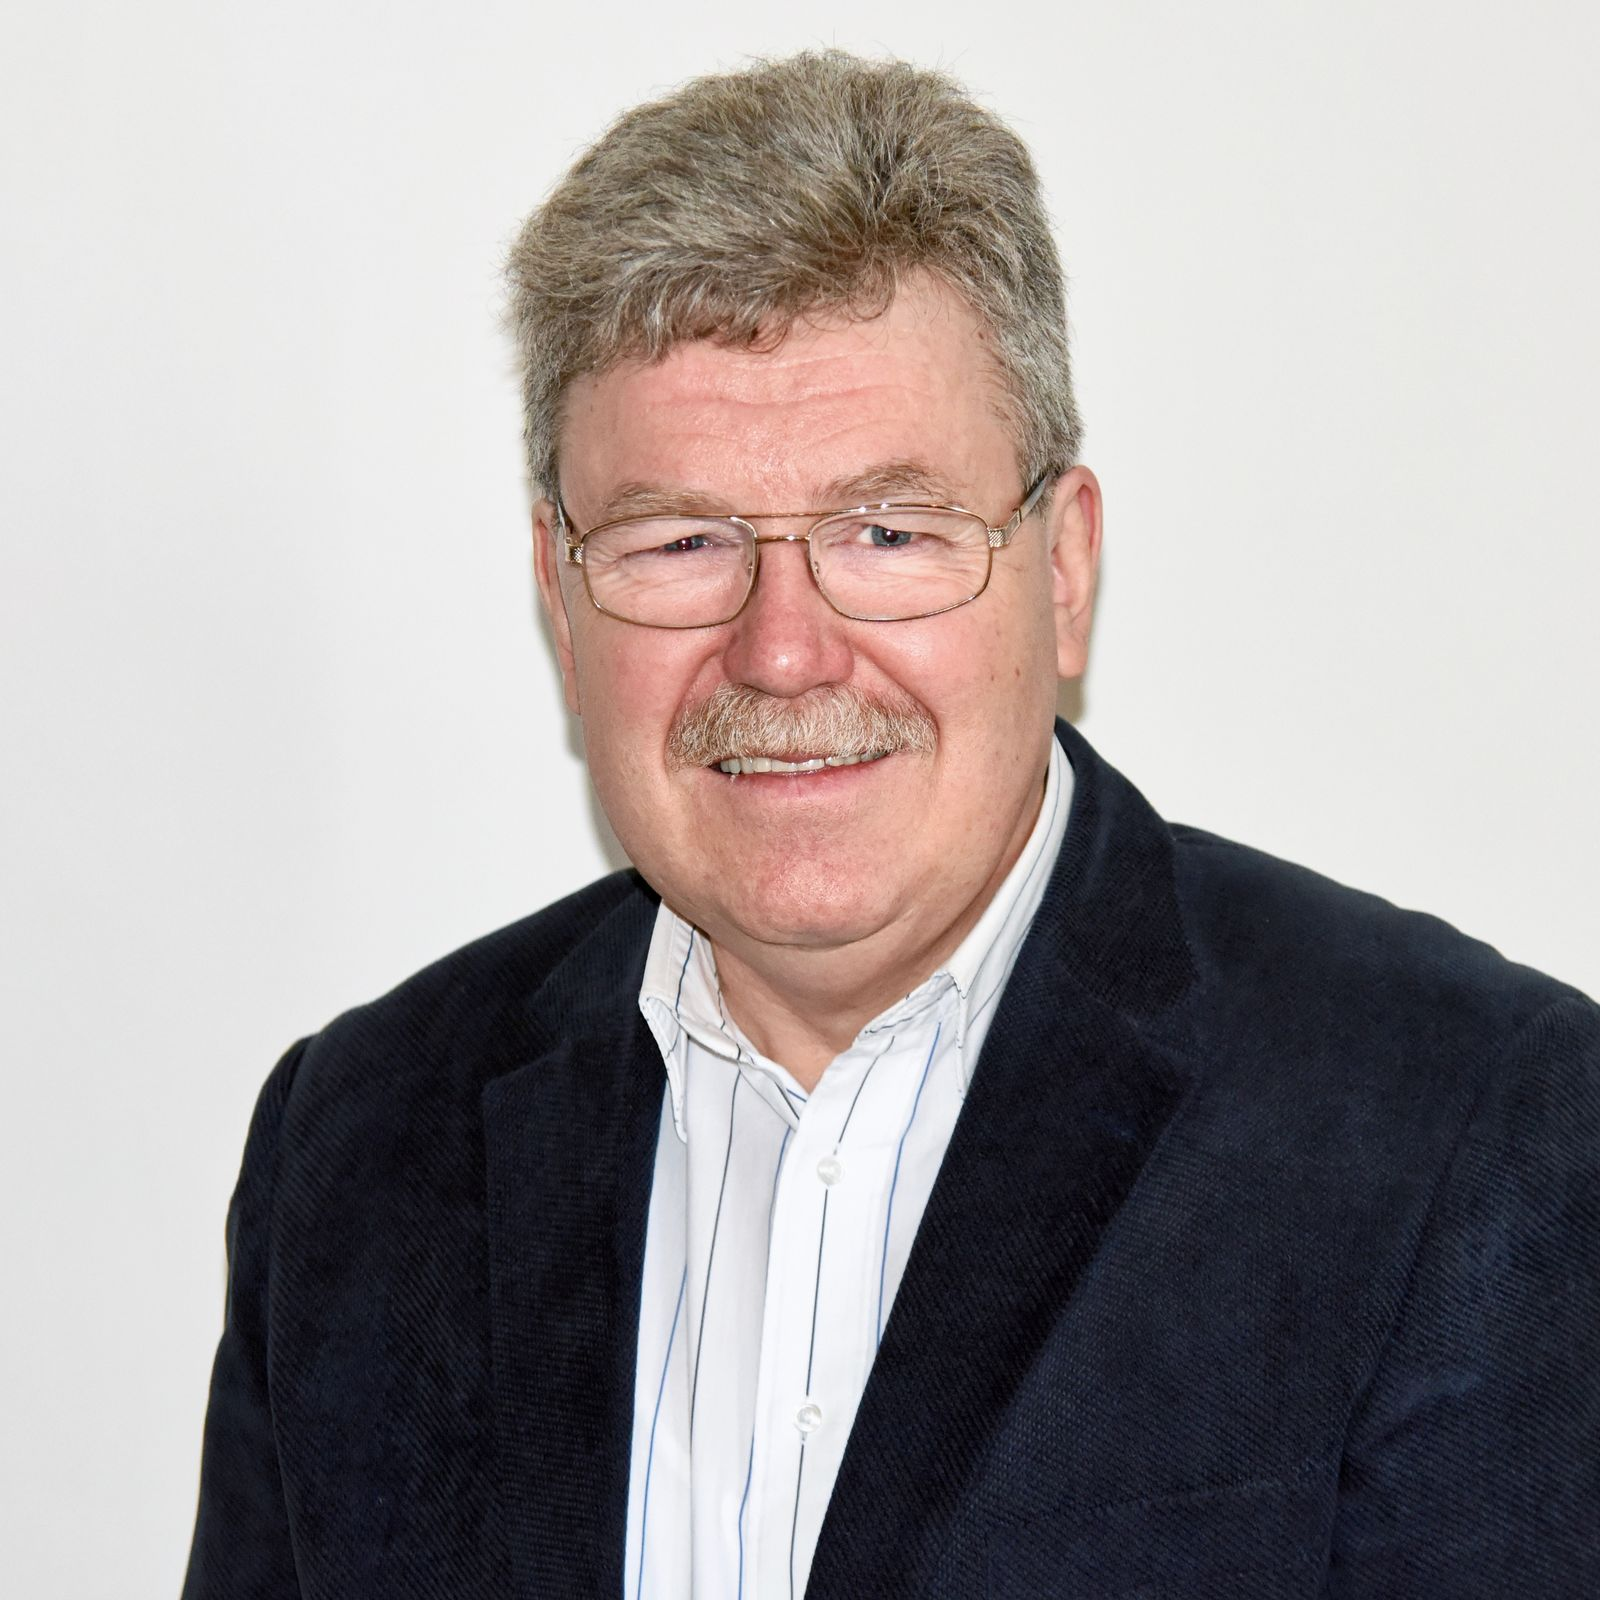 Gerd Weigel